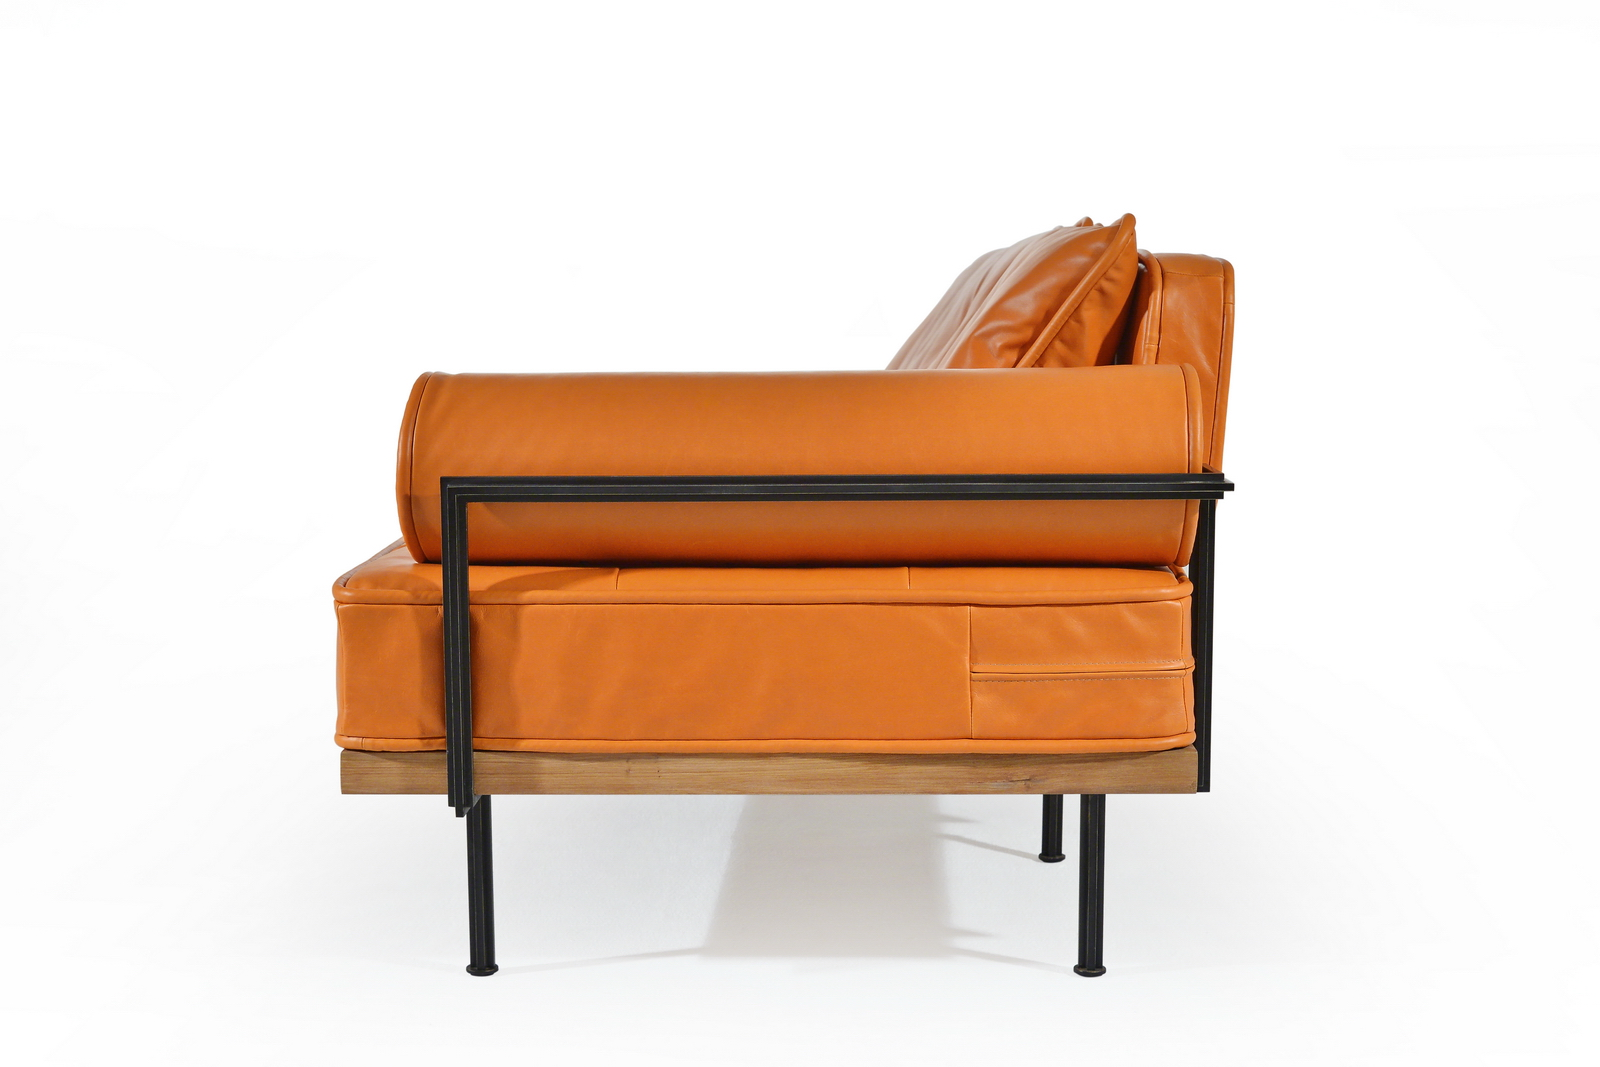 PTendercool-Sofa Corner-BS3-TE-BL-NO-Leather-210623-11